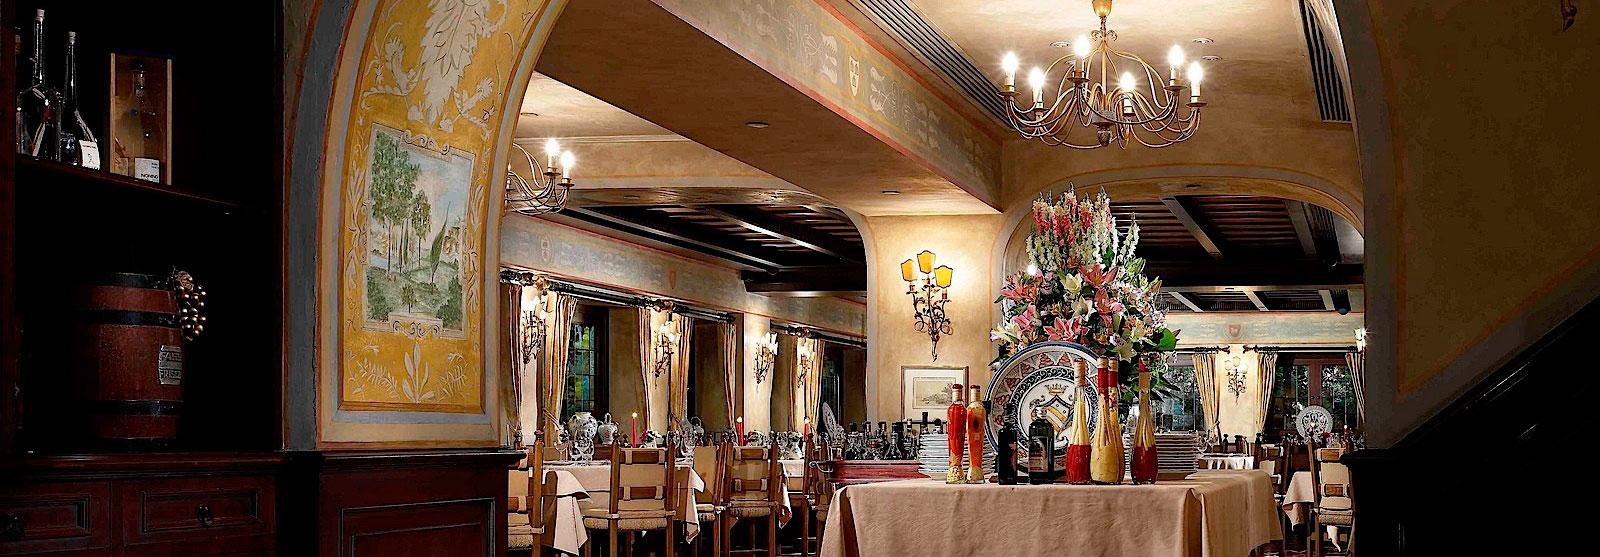 Restaurants In Tsim Sha Tsui The Royal Garden Hk Hotel